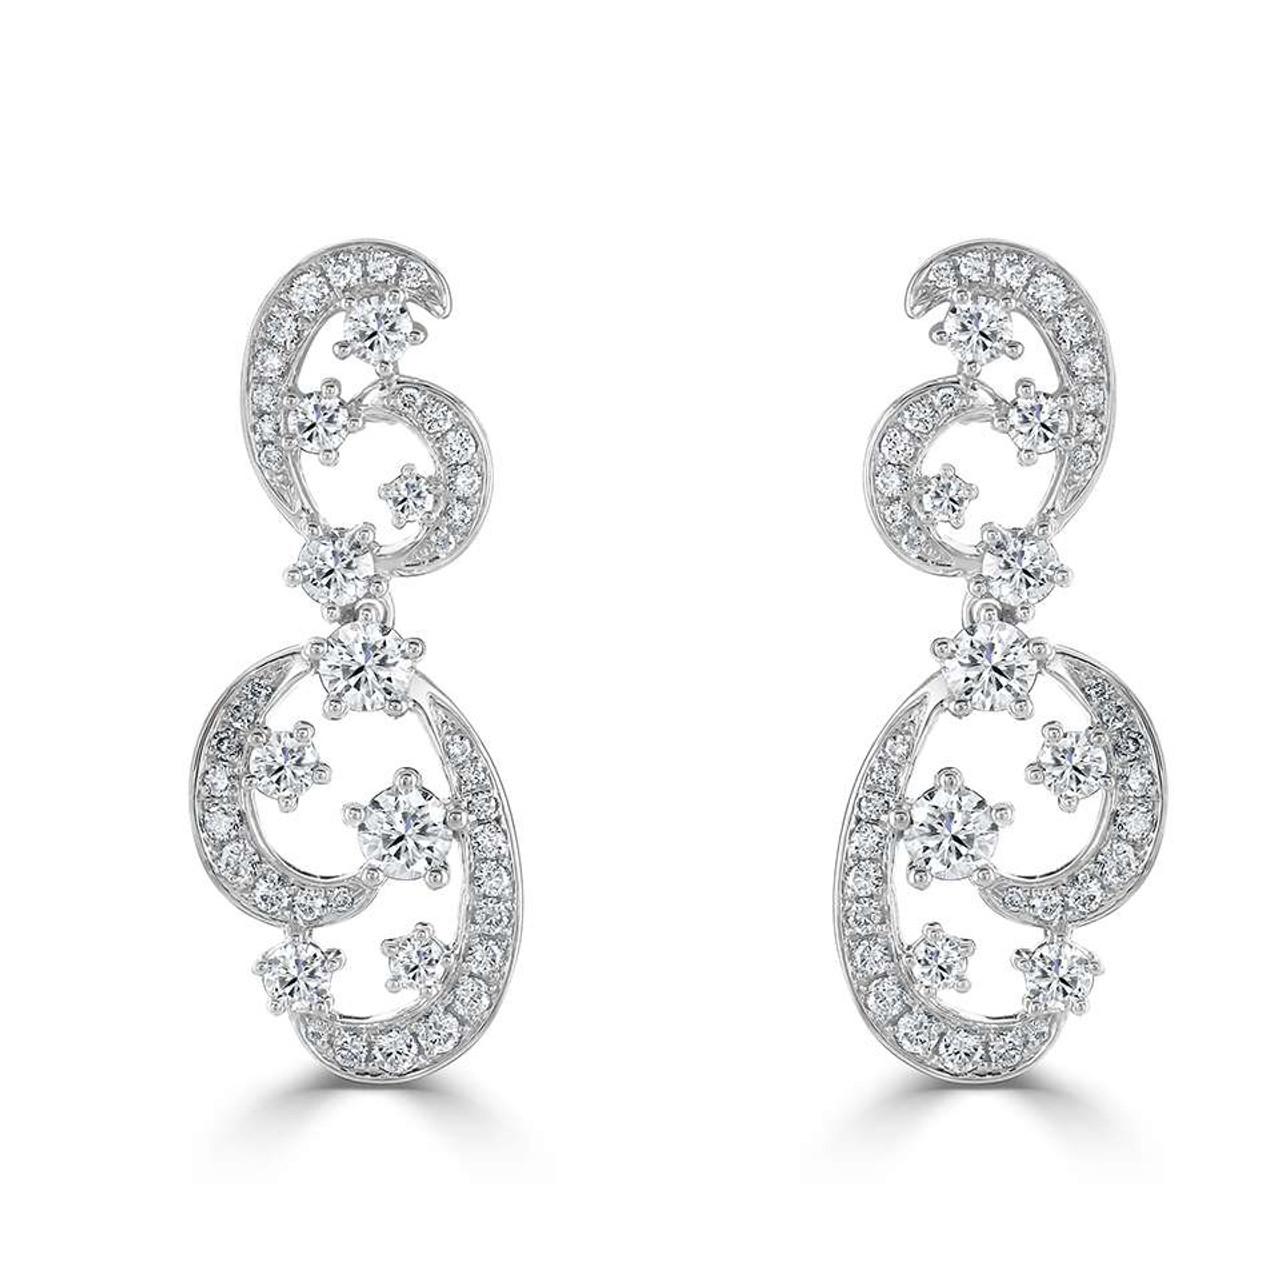 18ct White Gold Diamond Swirl Drop Earrings